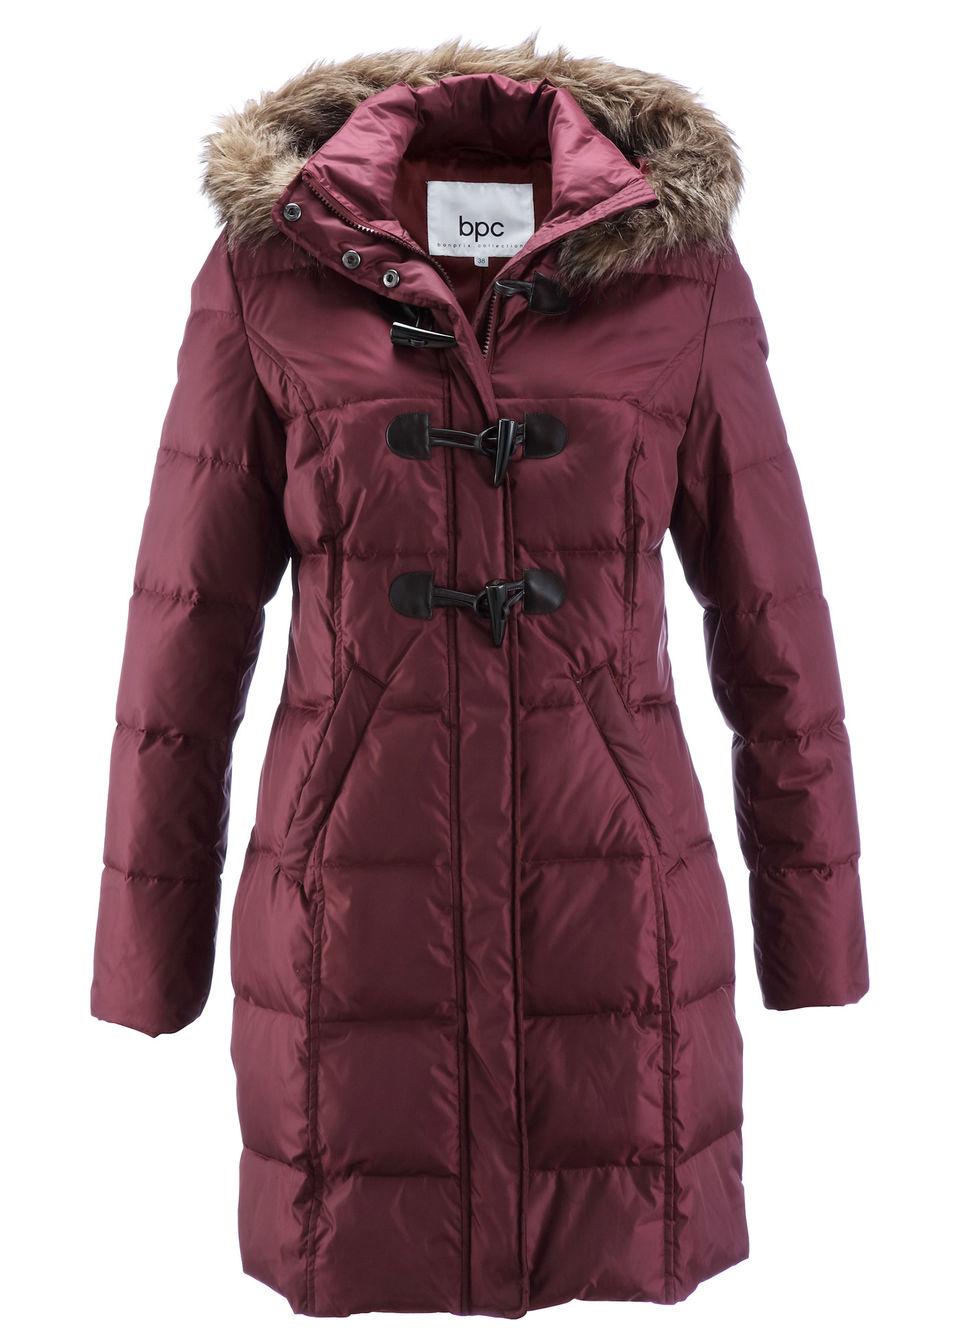 Płaszcz pikowany (lekki puch) bonprix Płaszcz pikowany czer.klon